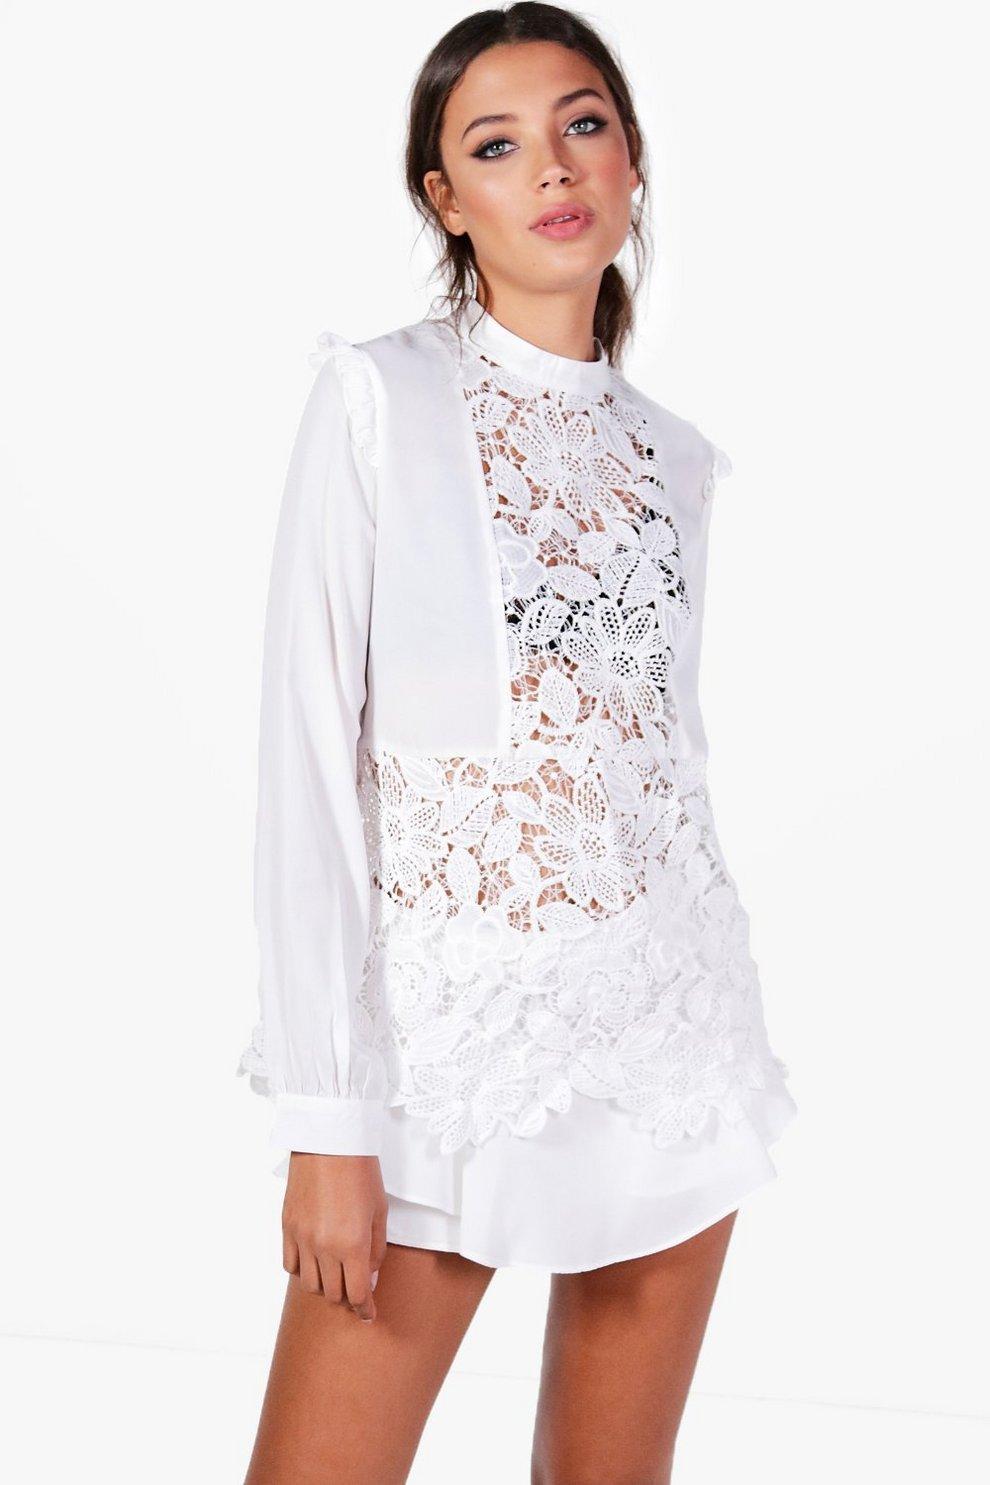 ab260f7003a Tall Elise Premium Lace Woven Shirt   Boohoo